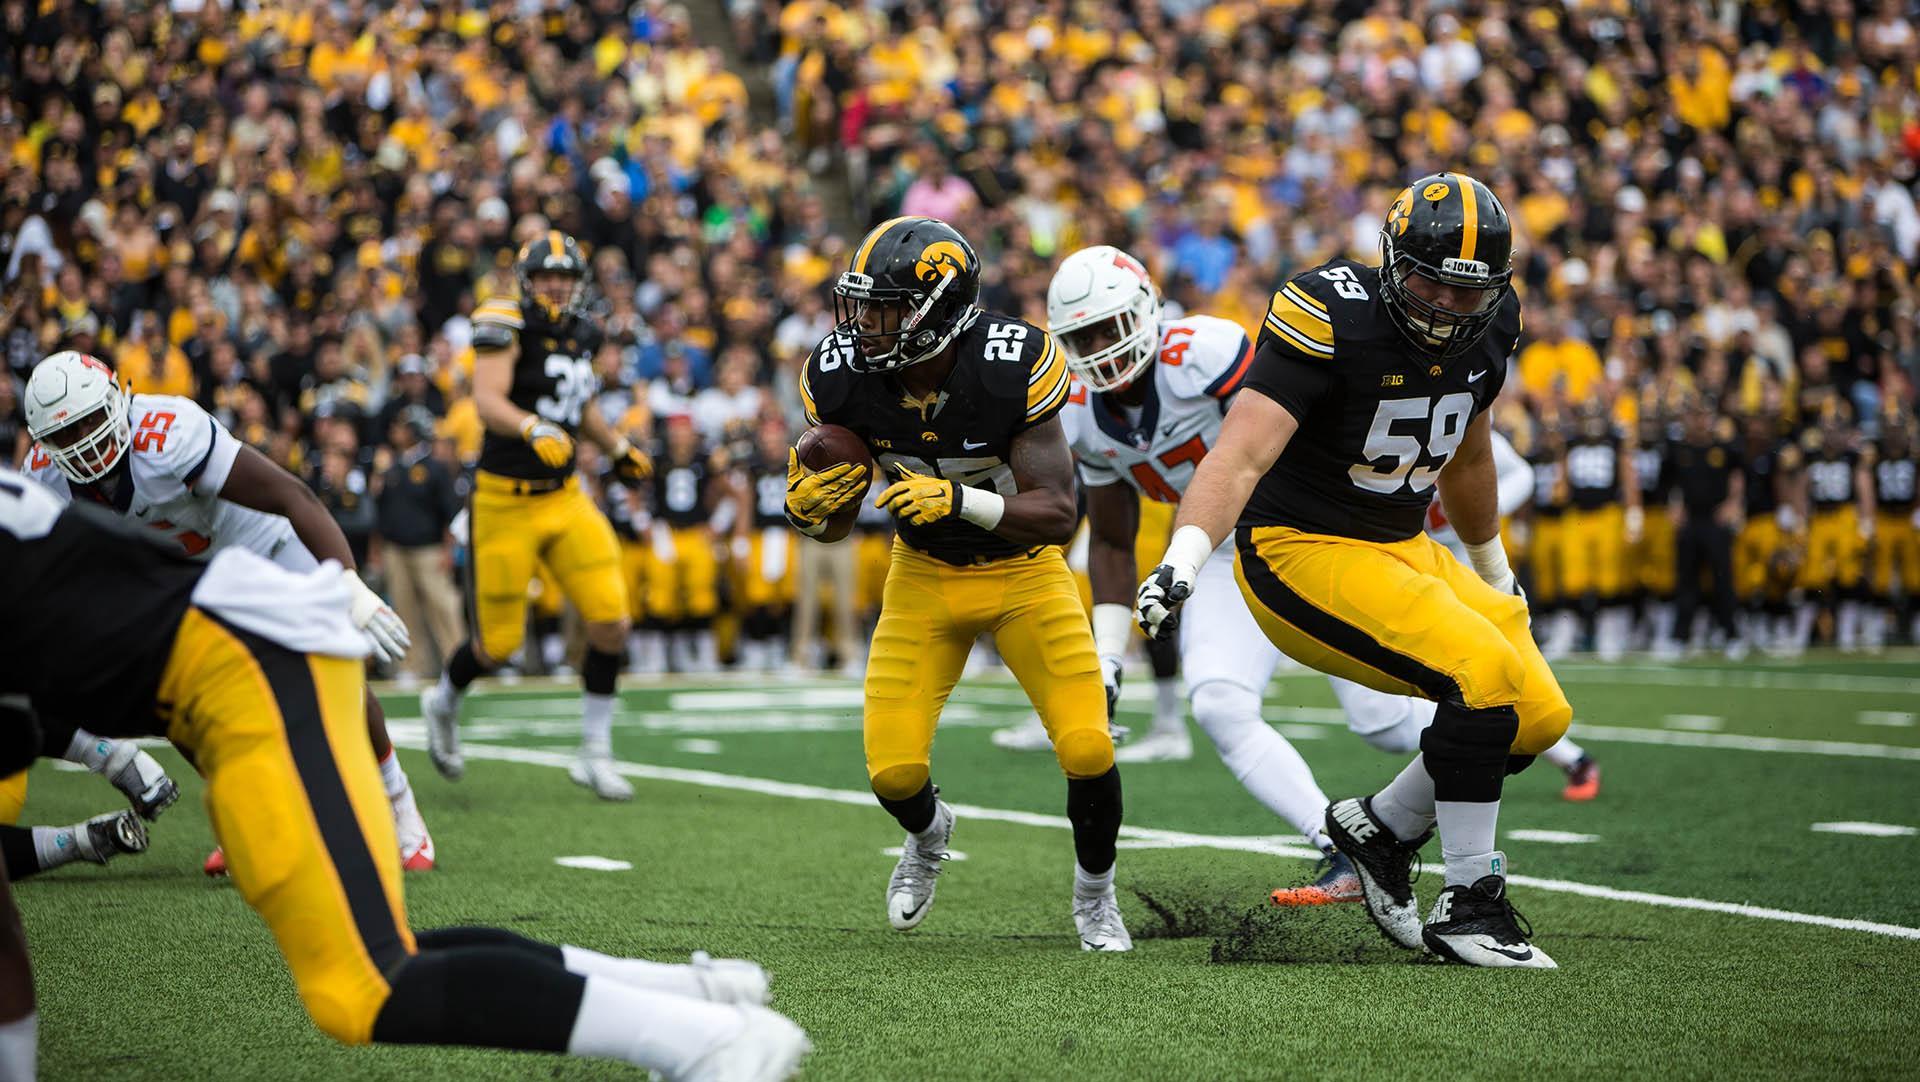 Iowa running back Akrum Wadley runs the ball during the Iowa/Illinois football game on Saturday, 7 Oct. 2017. Iowa won the game 45-16. (David Harmantas/The Daily Iowan)